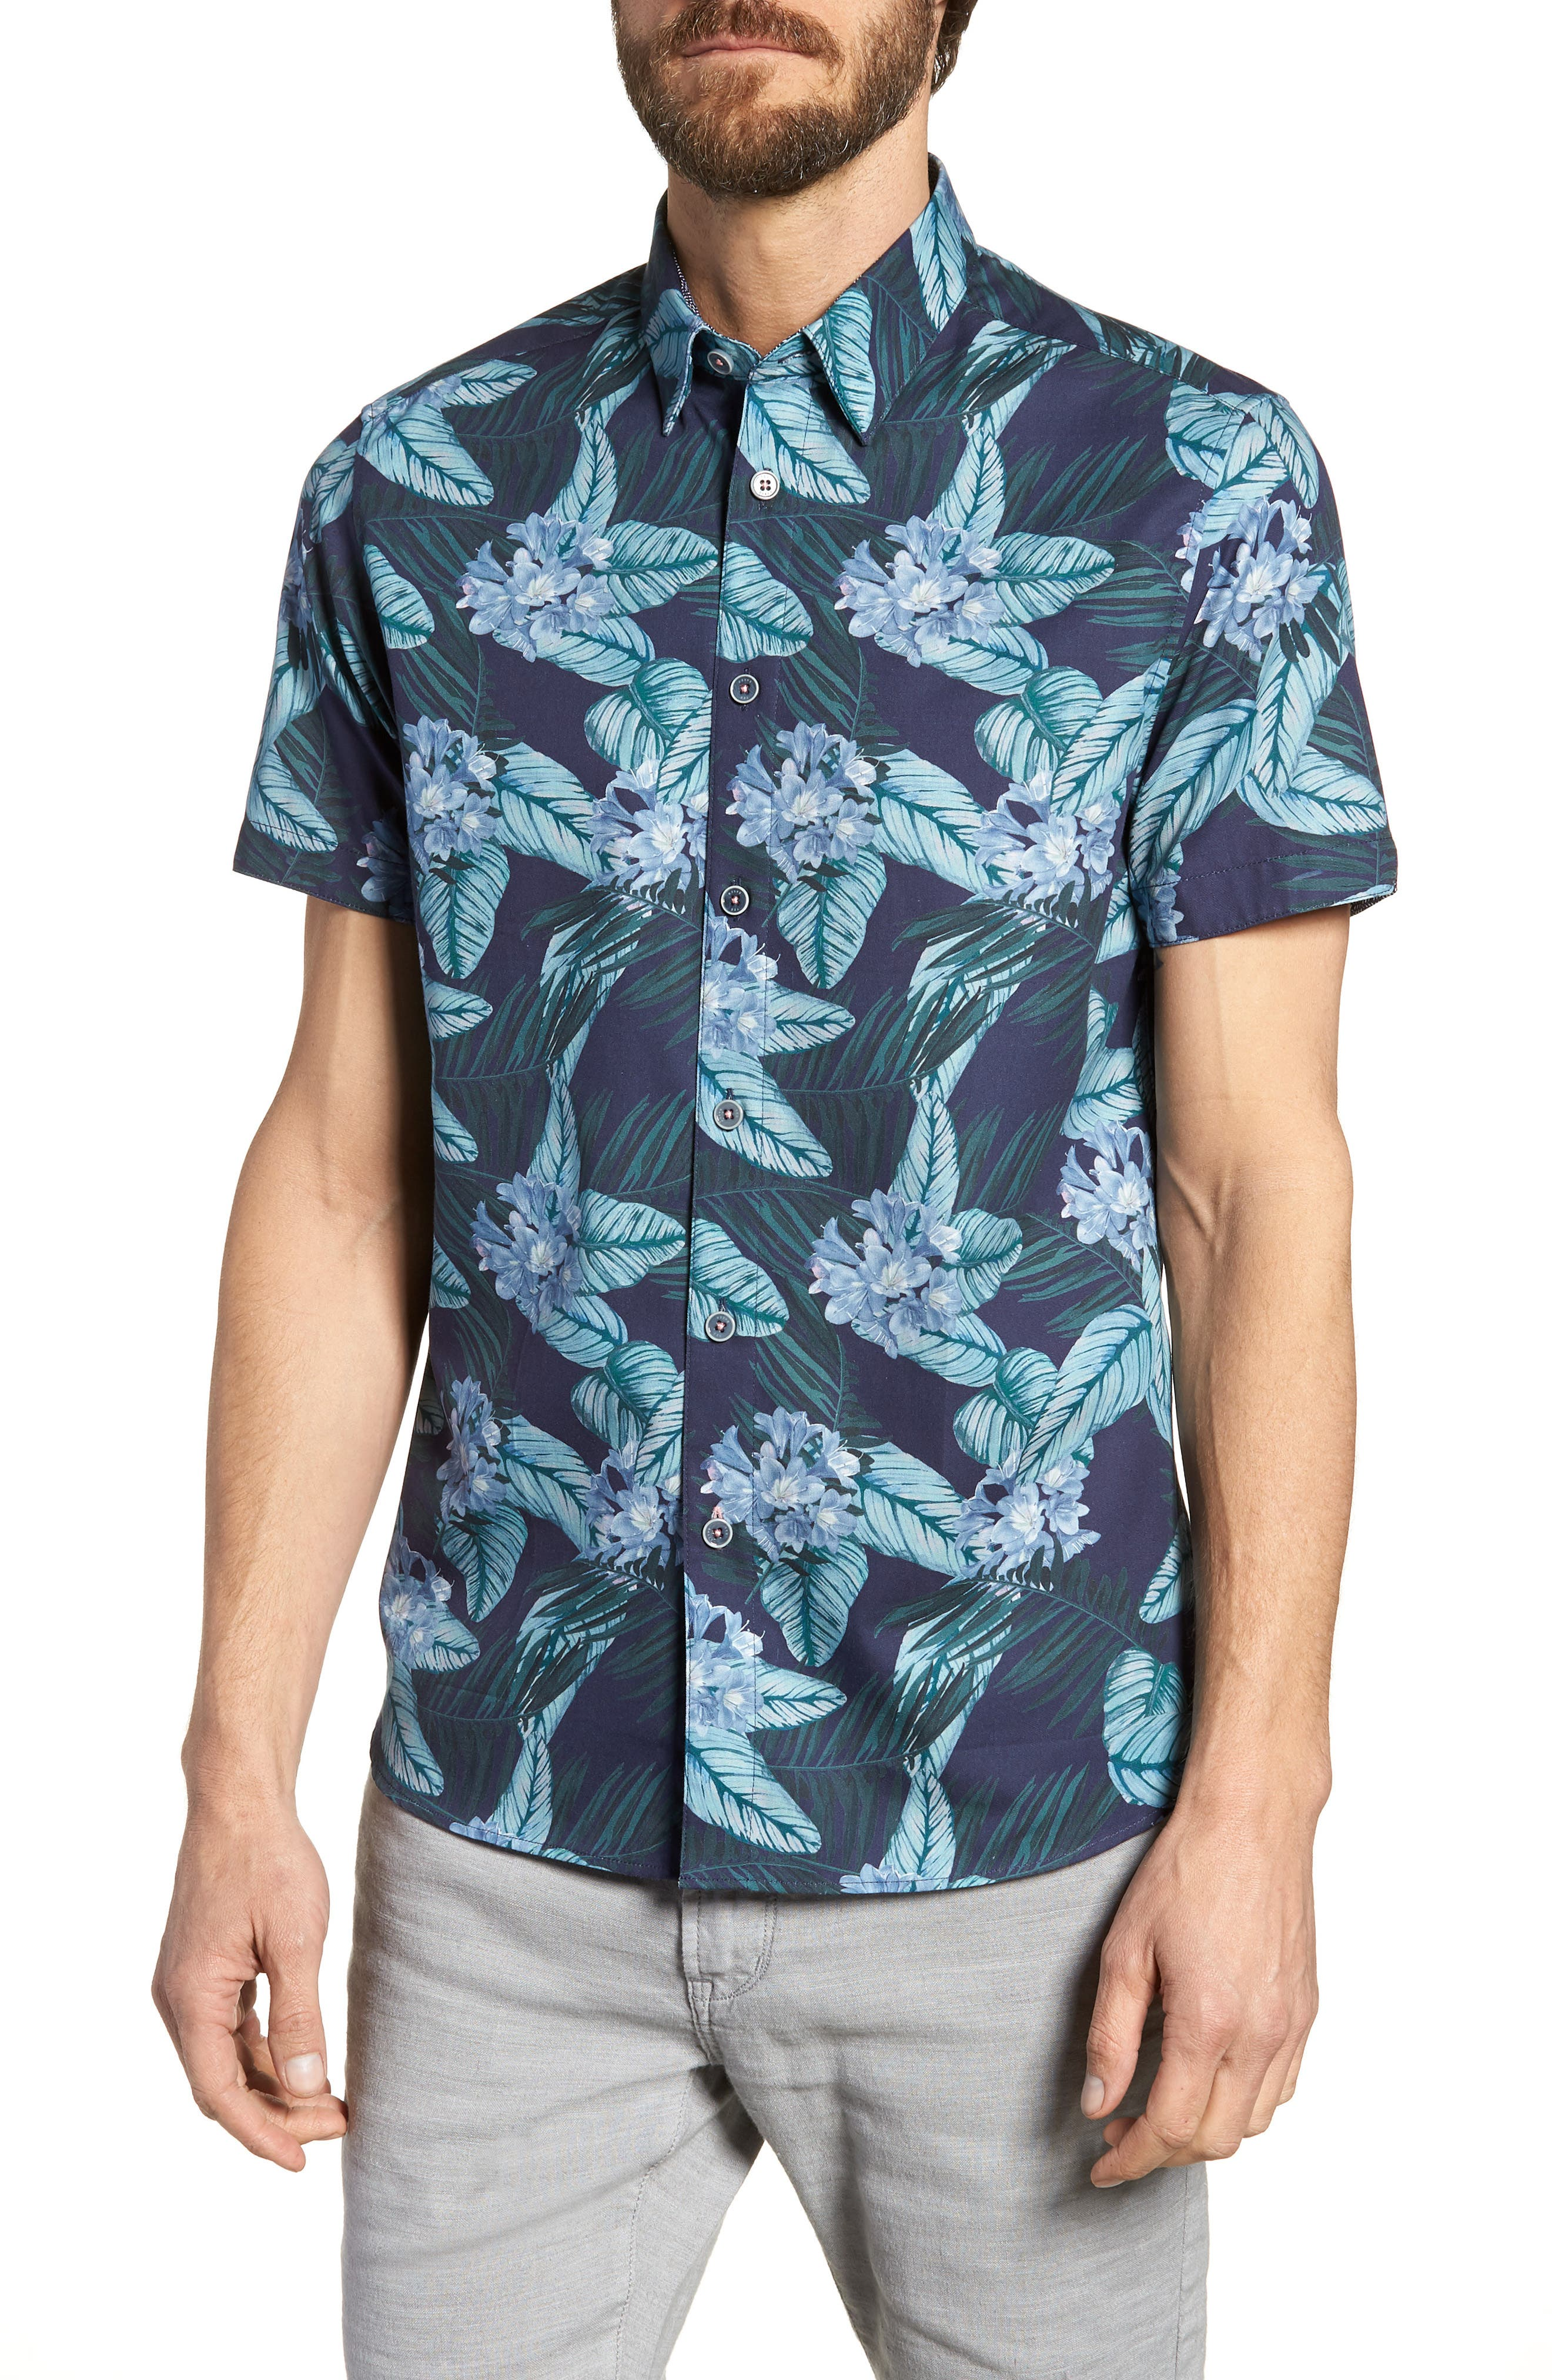 Folinor Slim Fit Floral Cotton Shirt,                             Main thumbnail 1, color,                             Navy